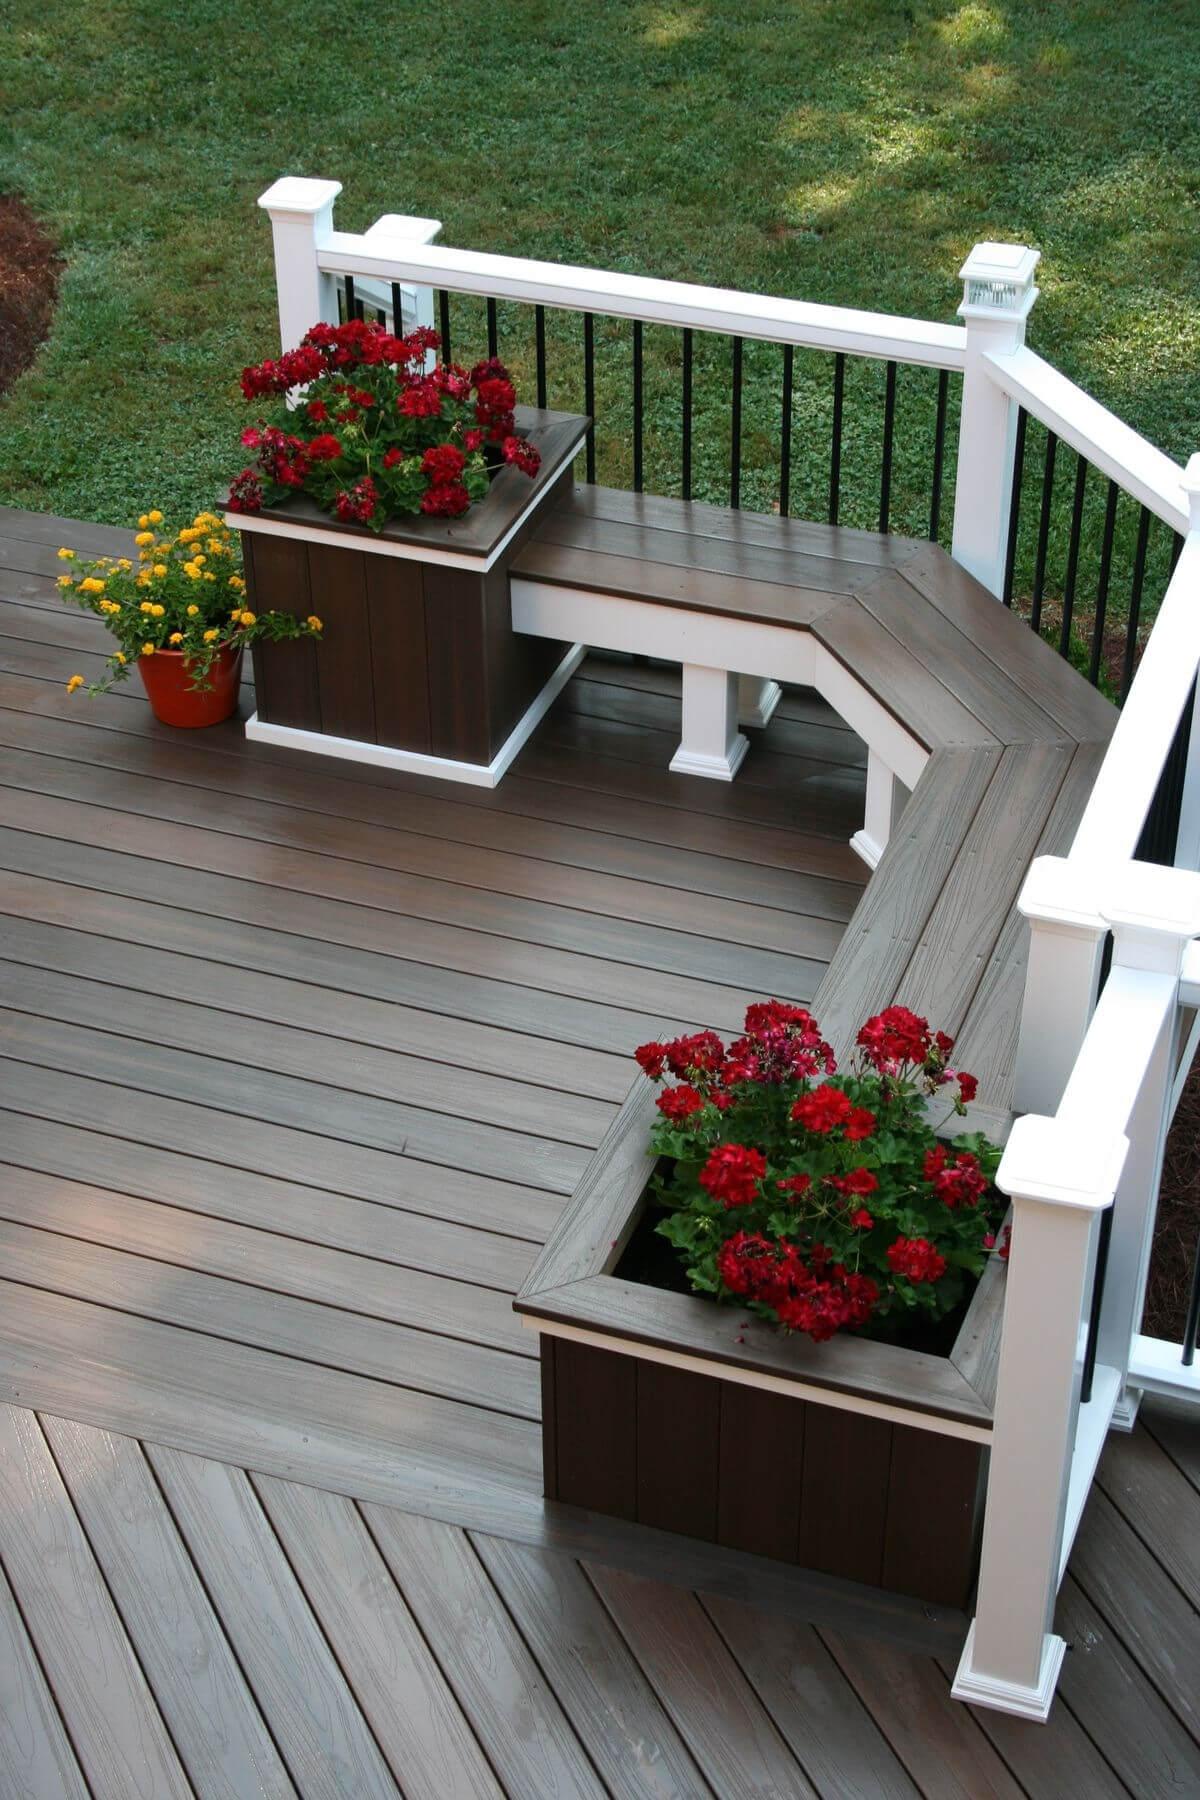 Deck Planter Ideas